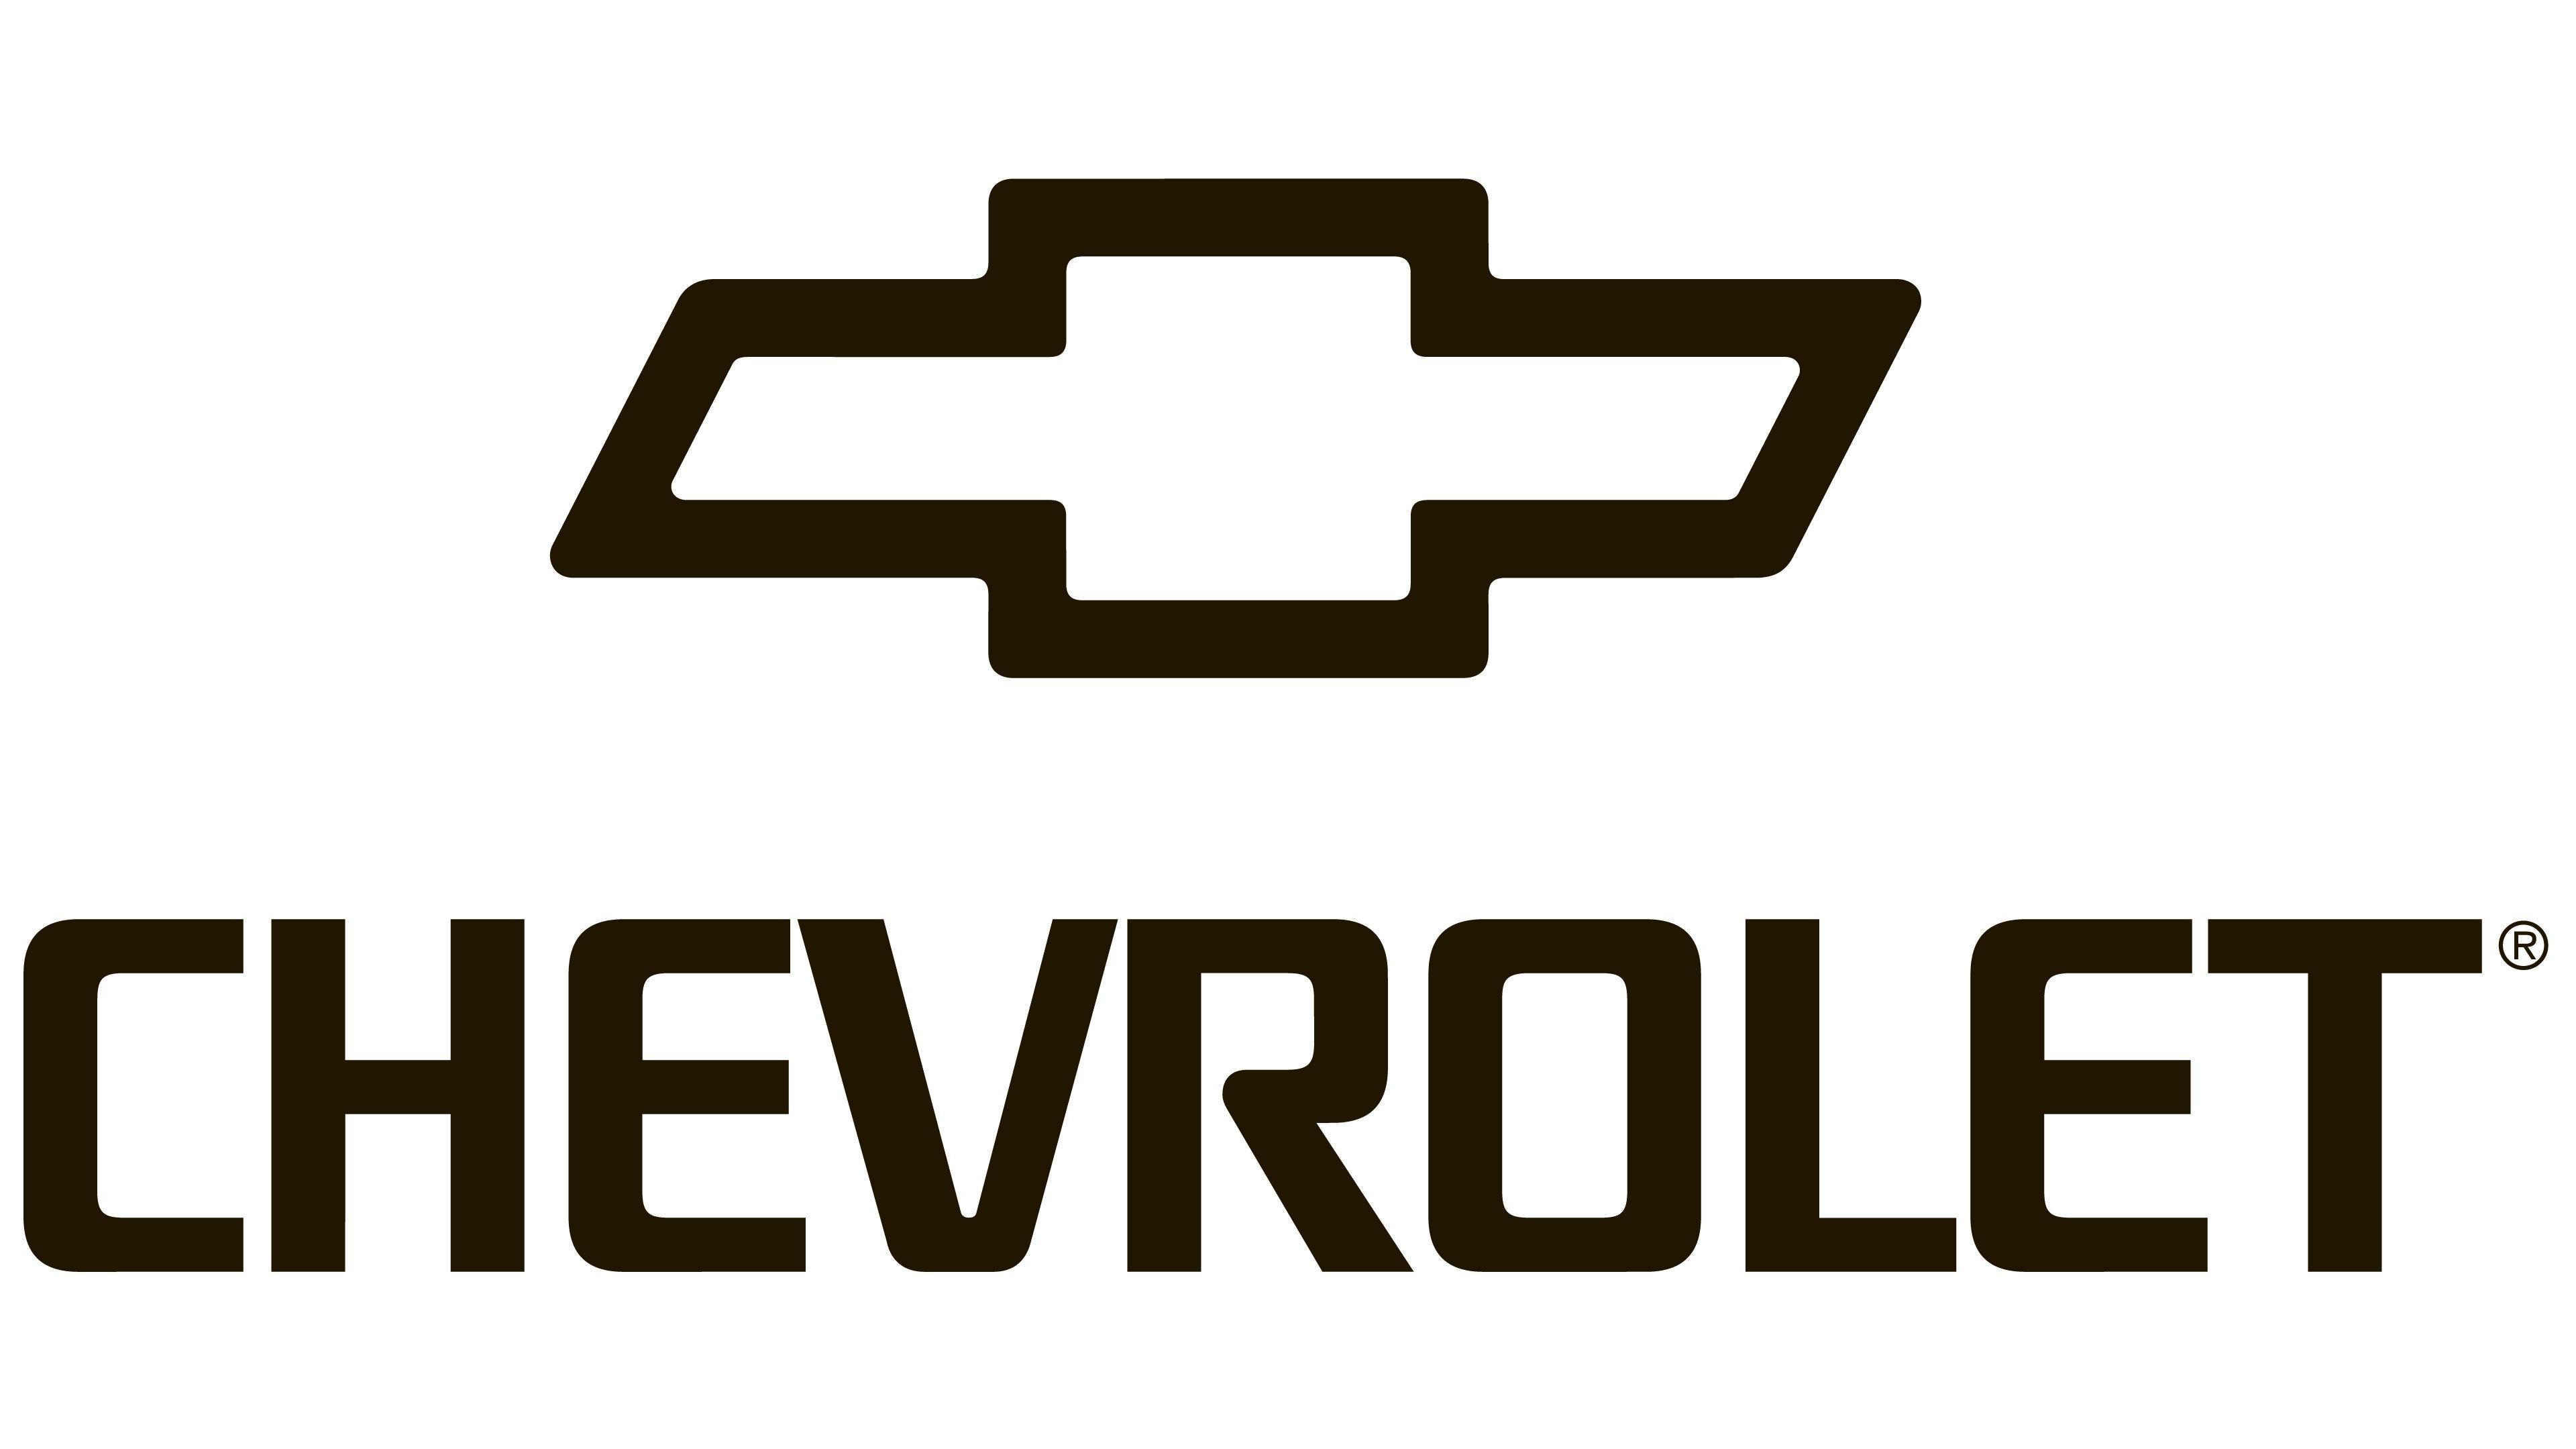 Symbol Chevrolet Chevrolet Chevrolet Logo Logos